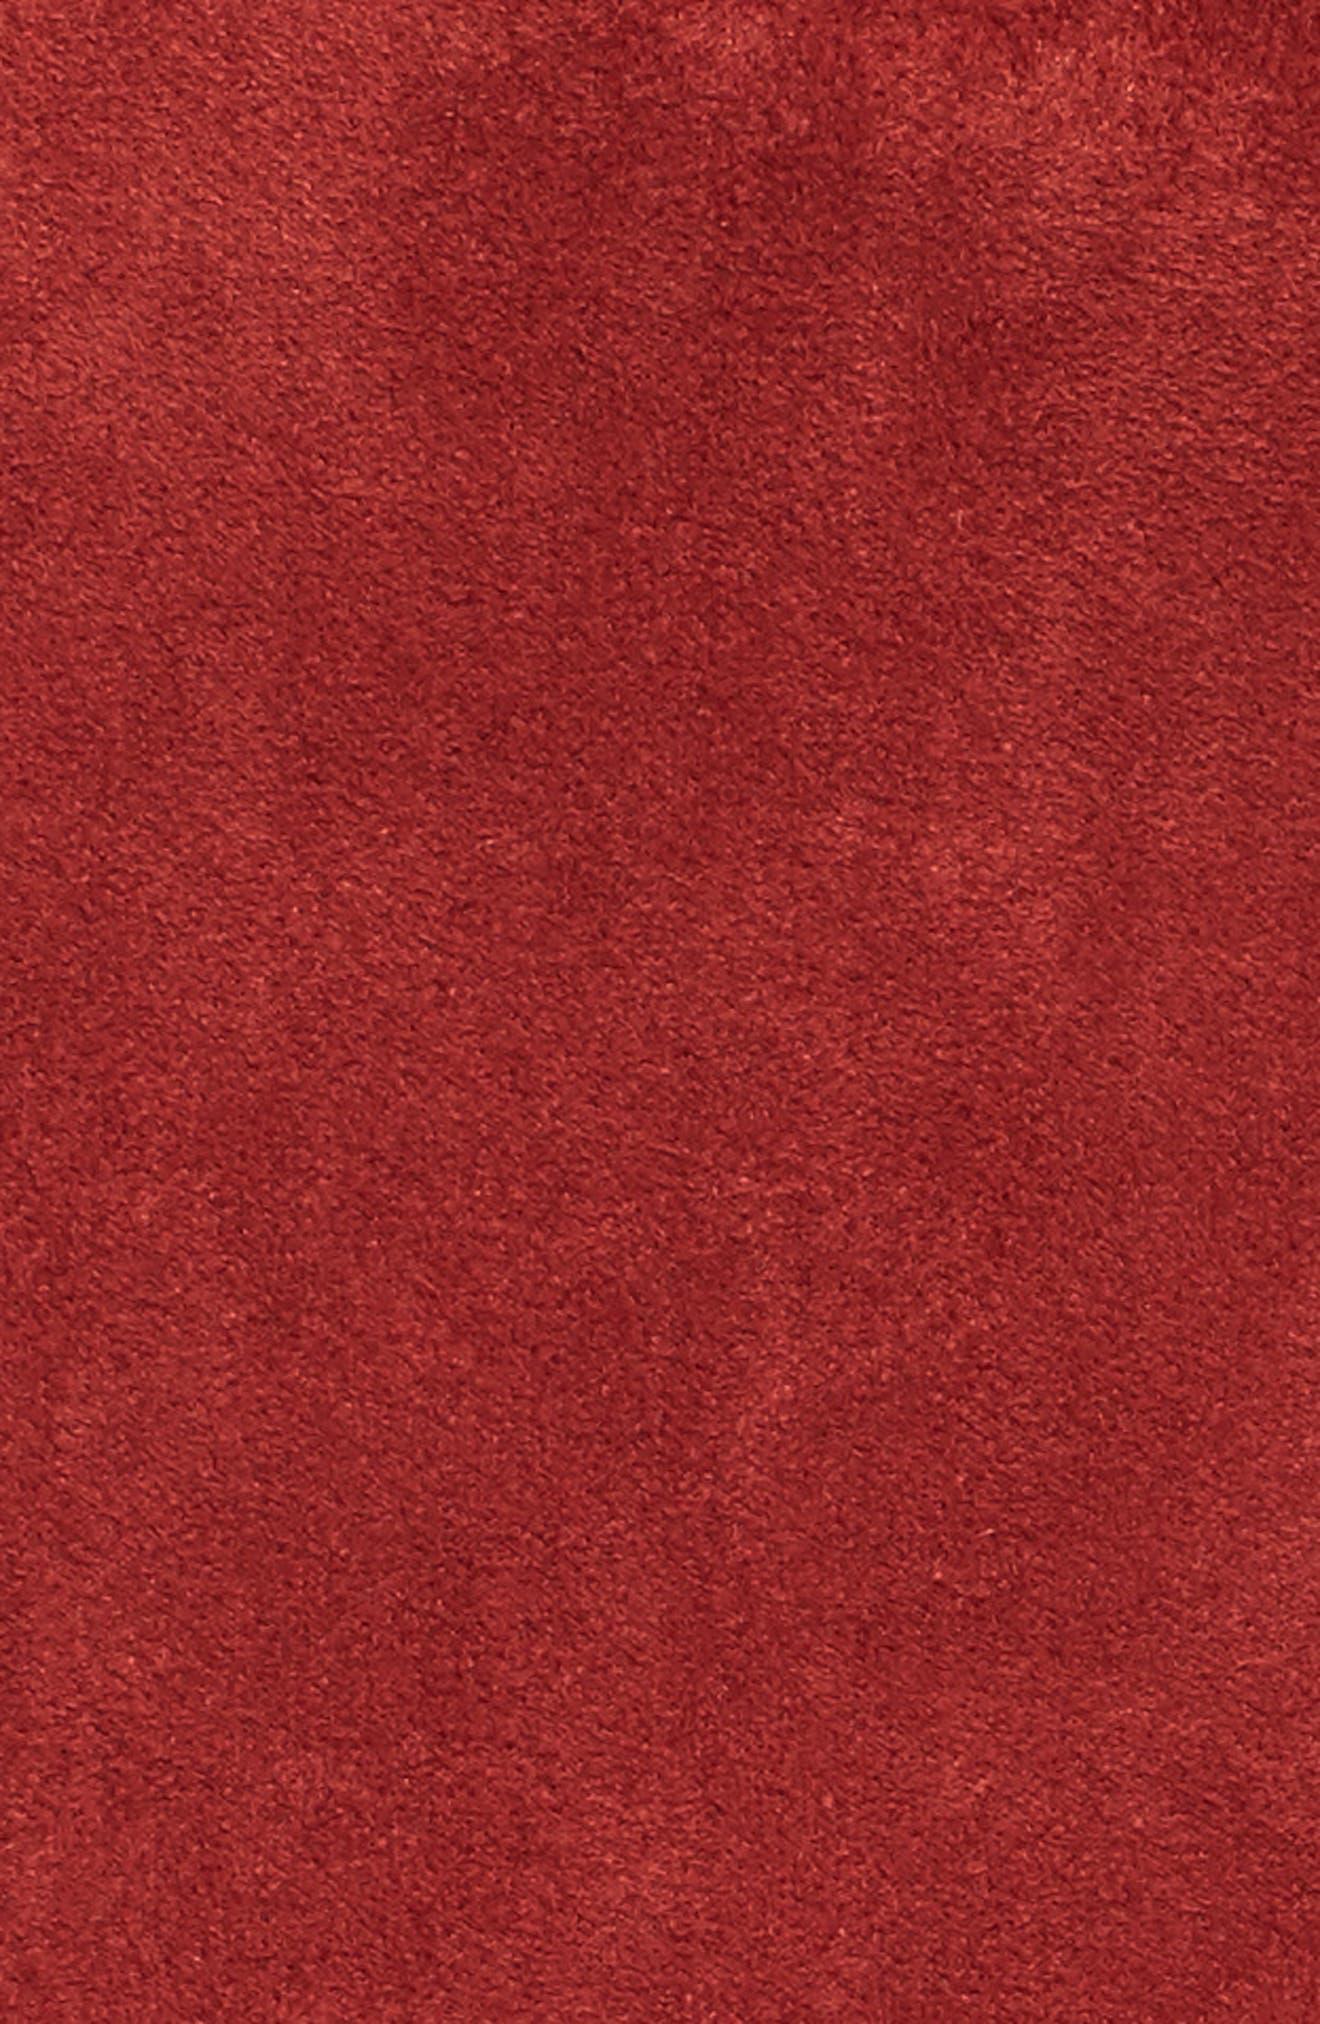 Faux Suede Ruffle Miniskirt,                             Alternate thumbnail 5, color,                             200